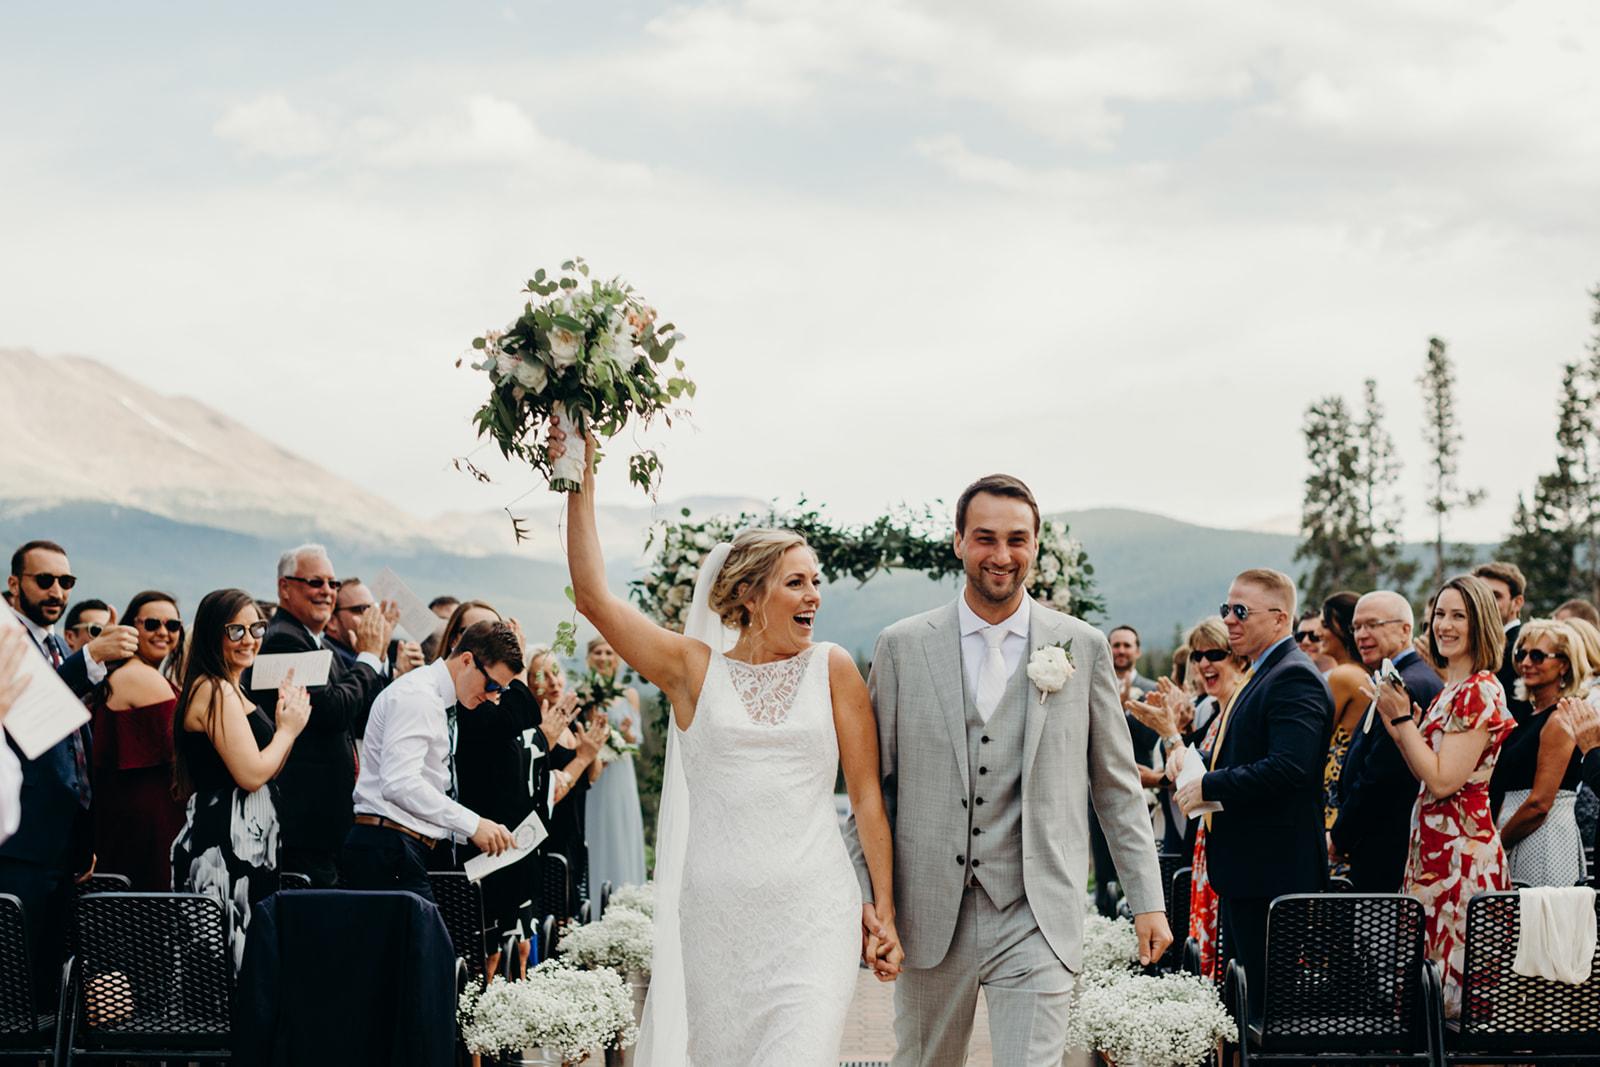 ten-mile-stadium-breckenridge-wedding-photographer-101.jpg